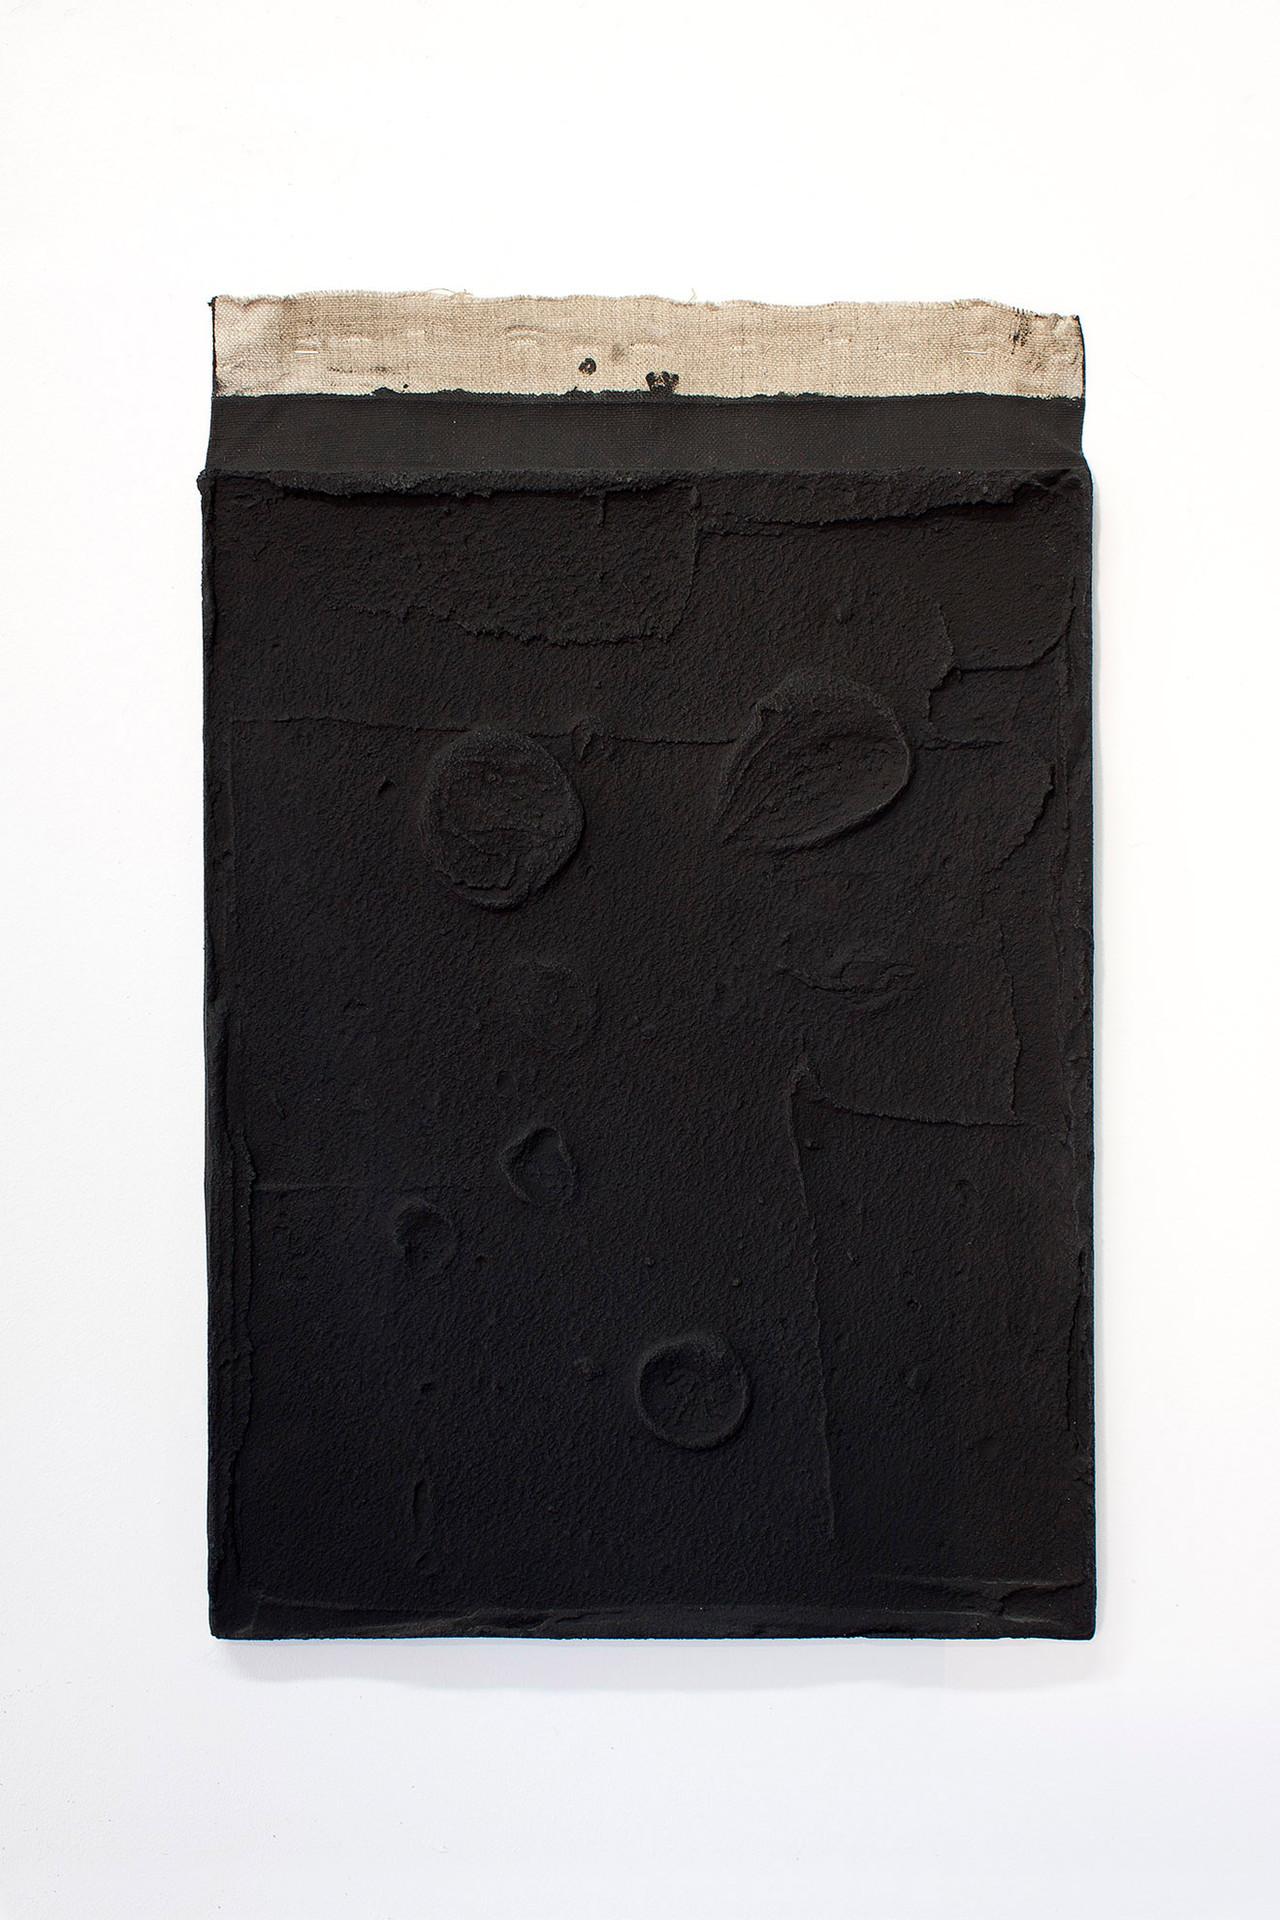 Sin título, 2017. Acrylic, sand and limestone on linen. 58 x 38 cm.